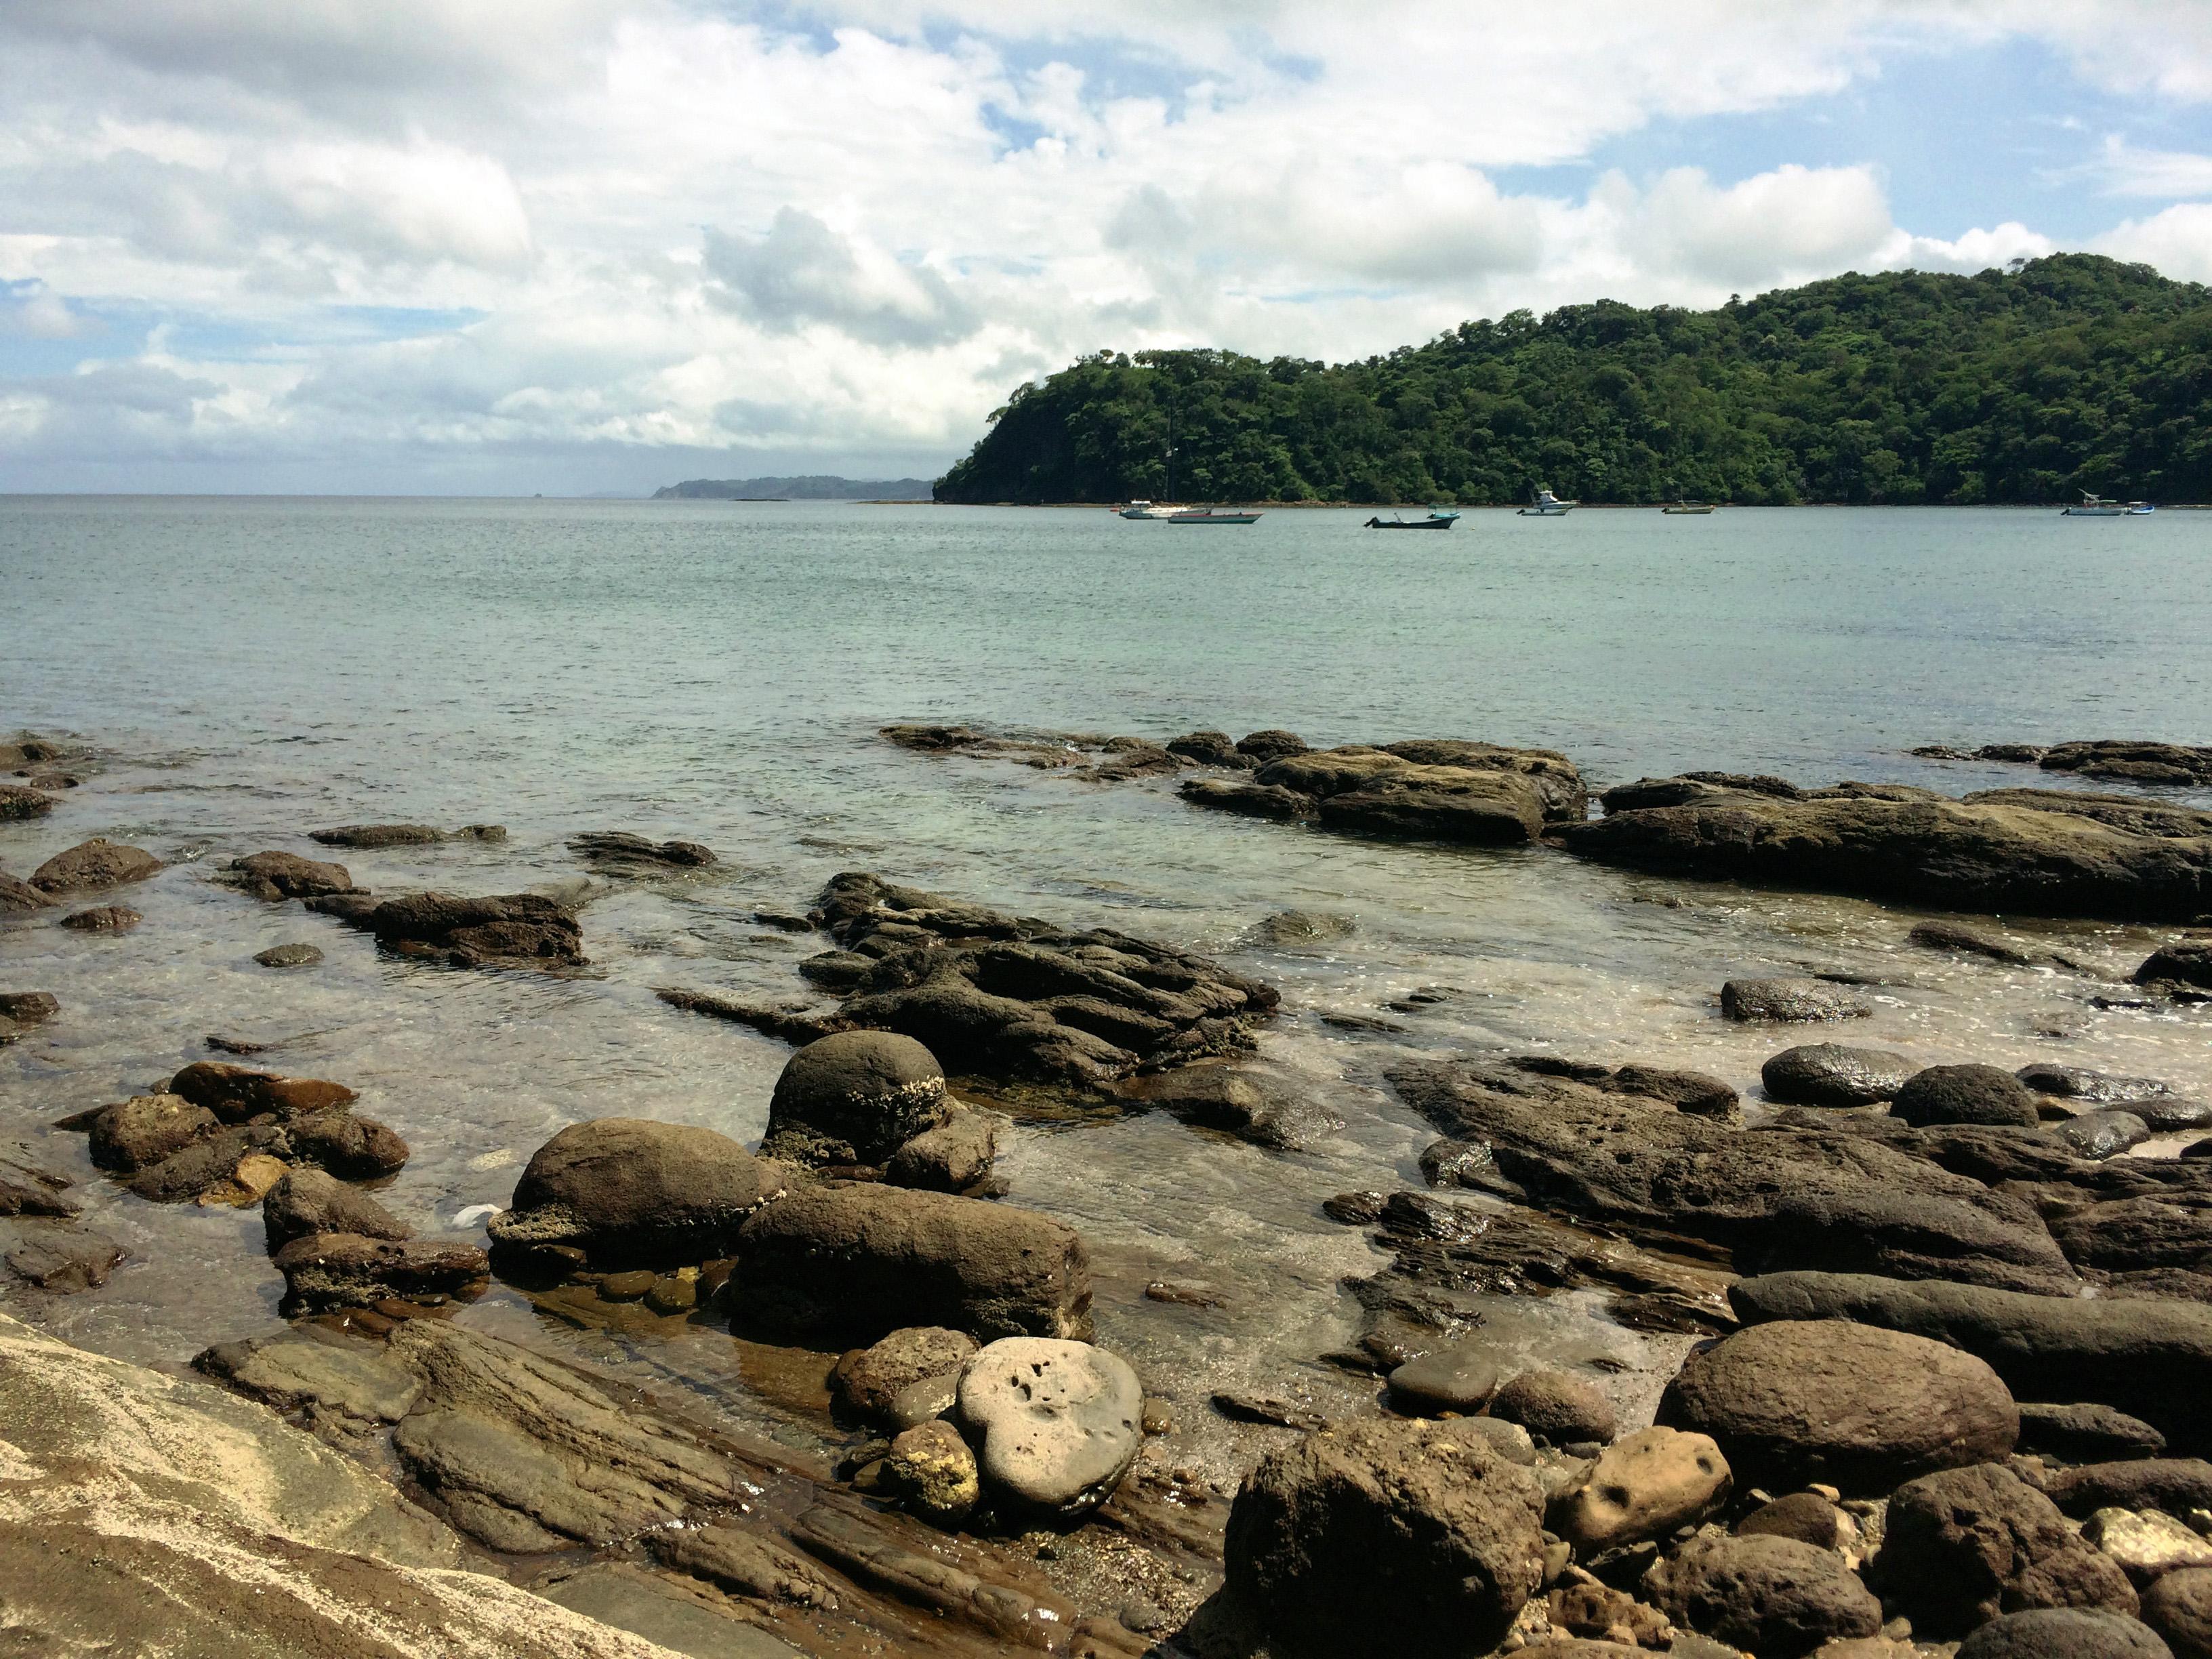 La Playa De Jobo In Costa Rica Image Free Stock Photo Public Domain Photo Cc0 Images